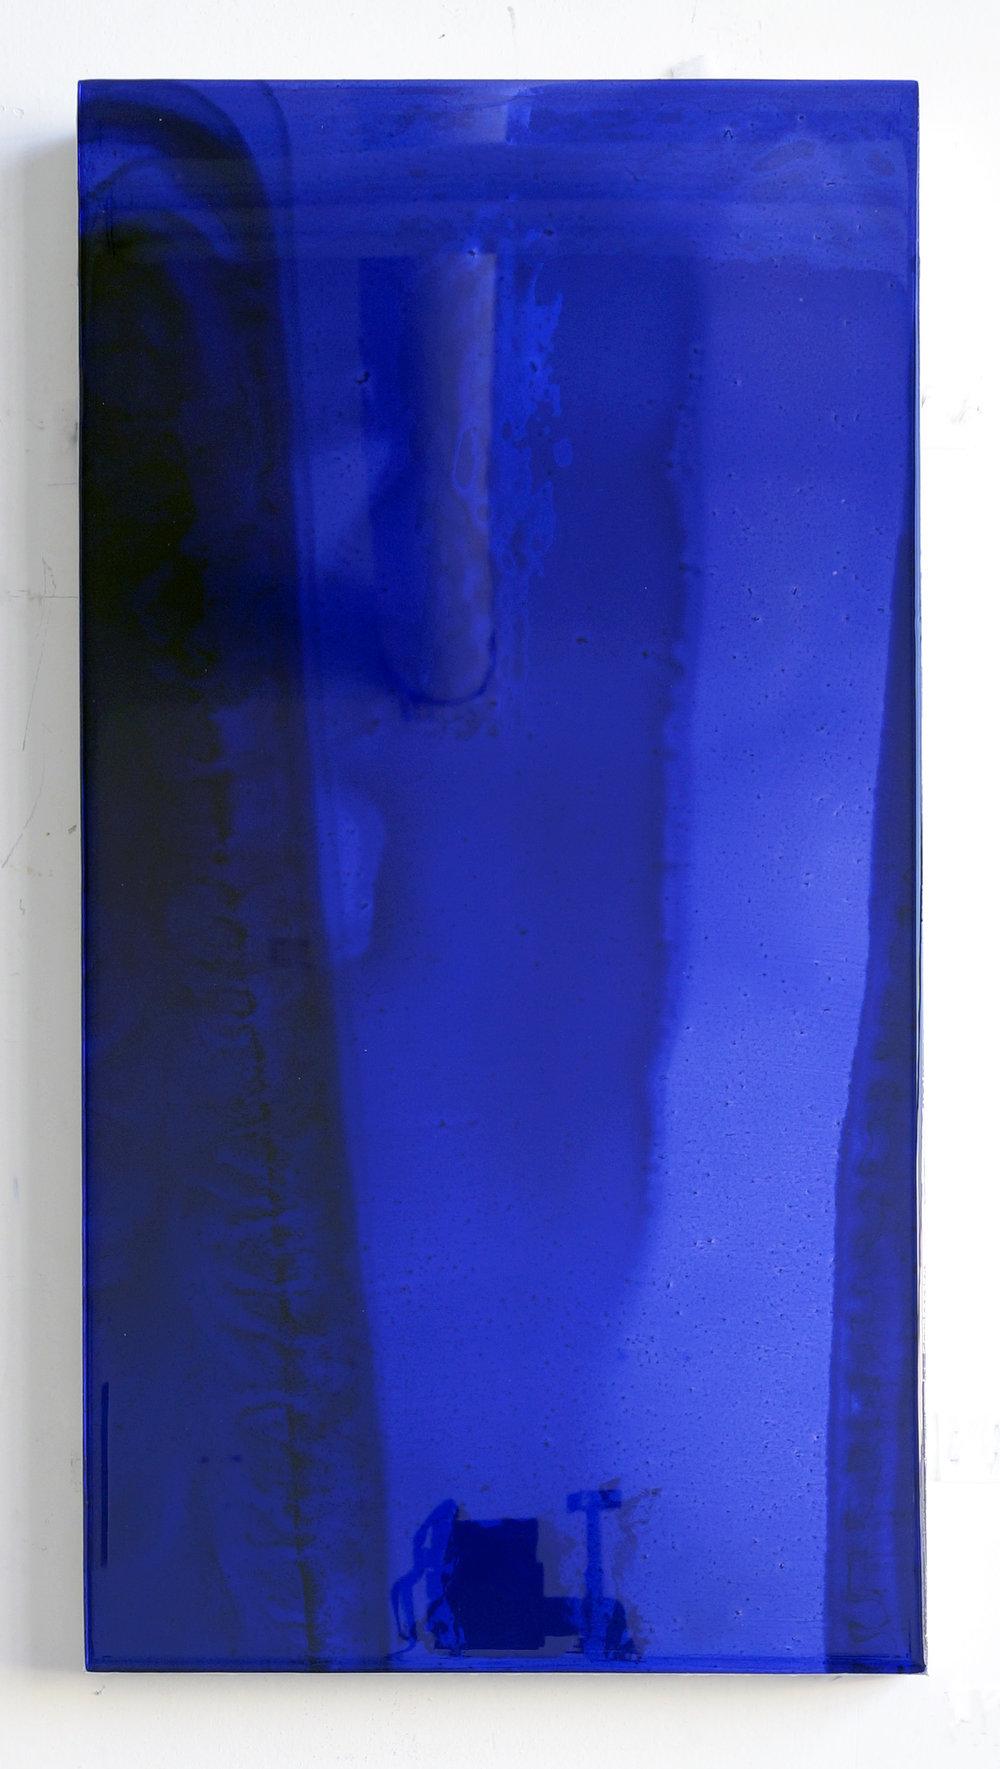 19 by 10 (deep blue), 2017